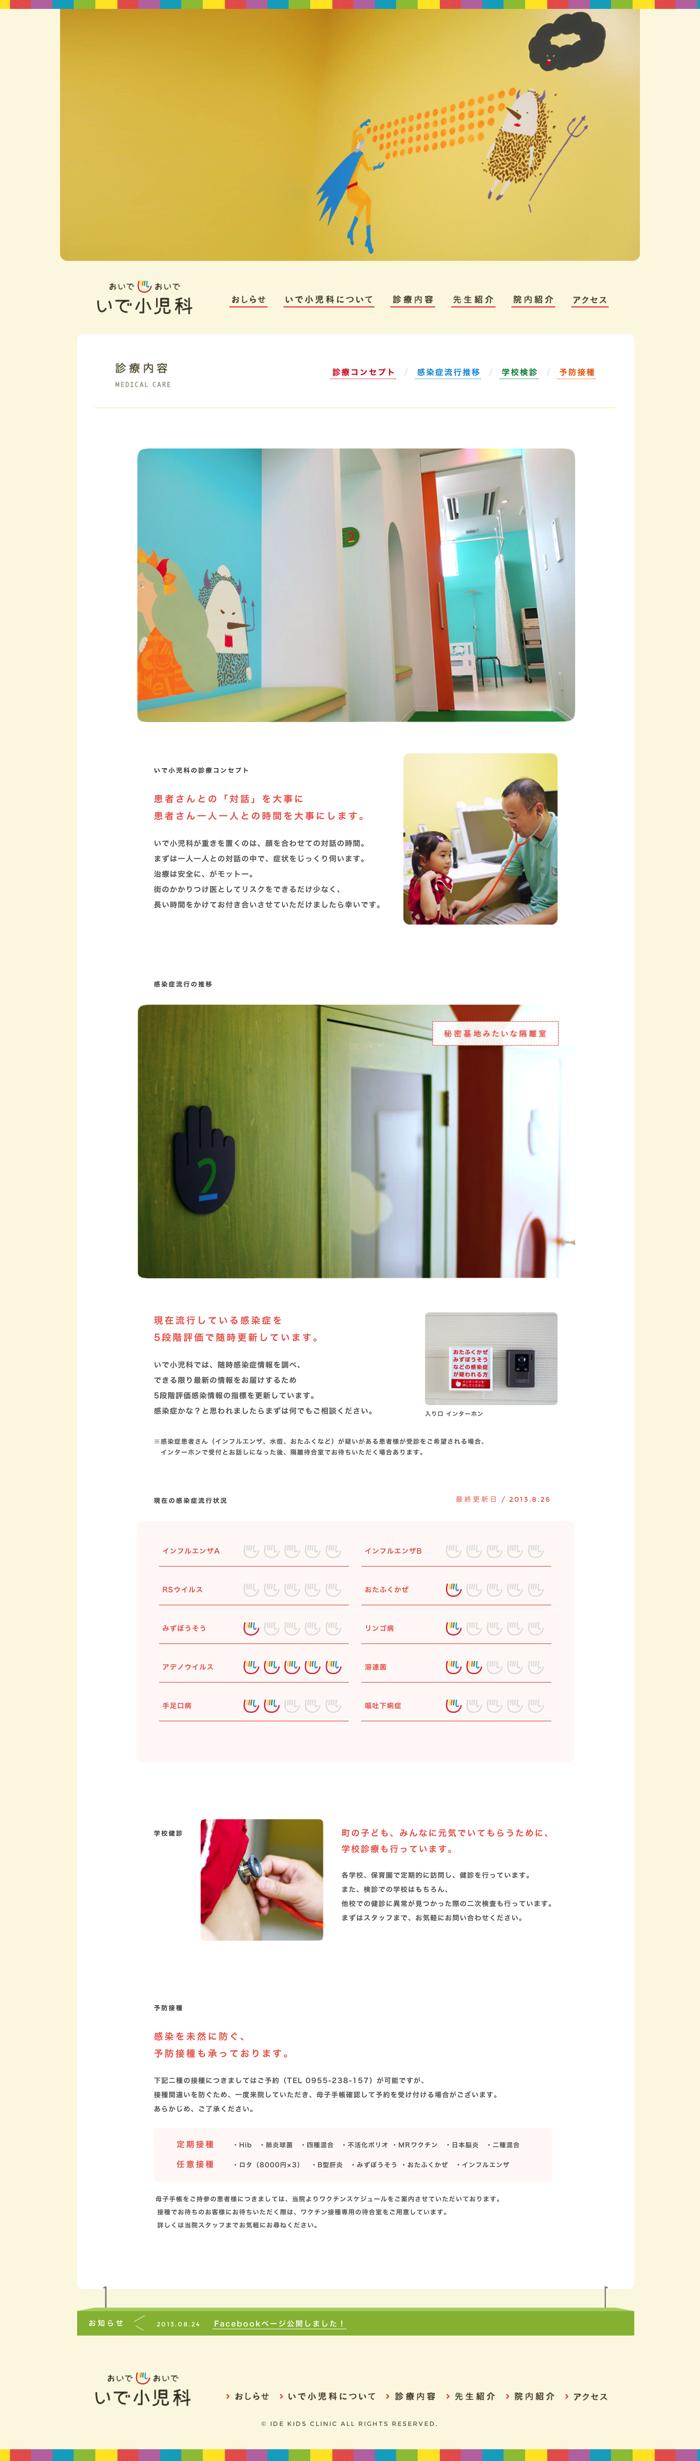 診療内容 | いで小児科 | 佐賀県伊万里市の小児科医院